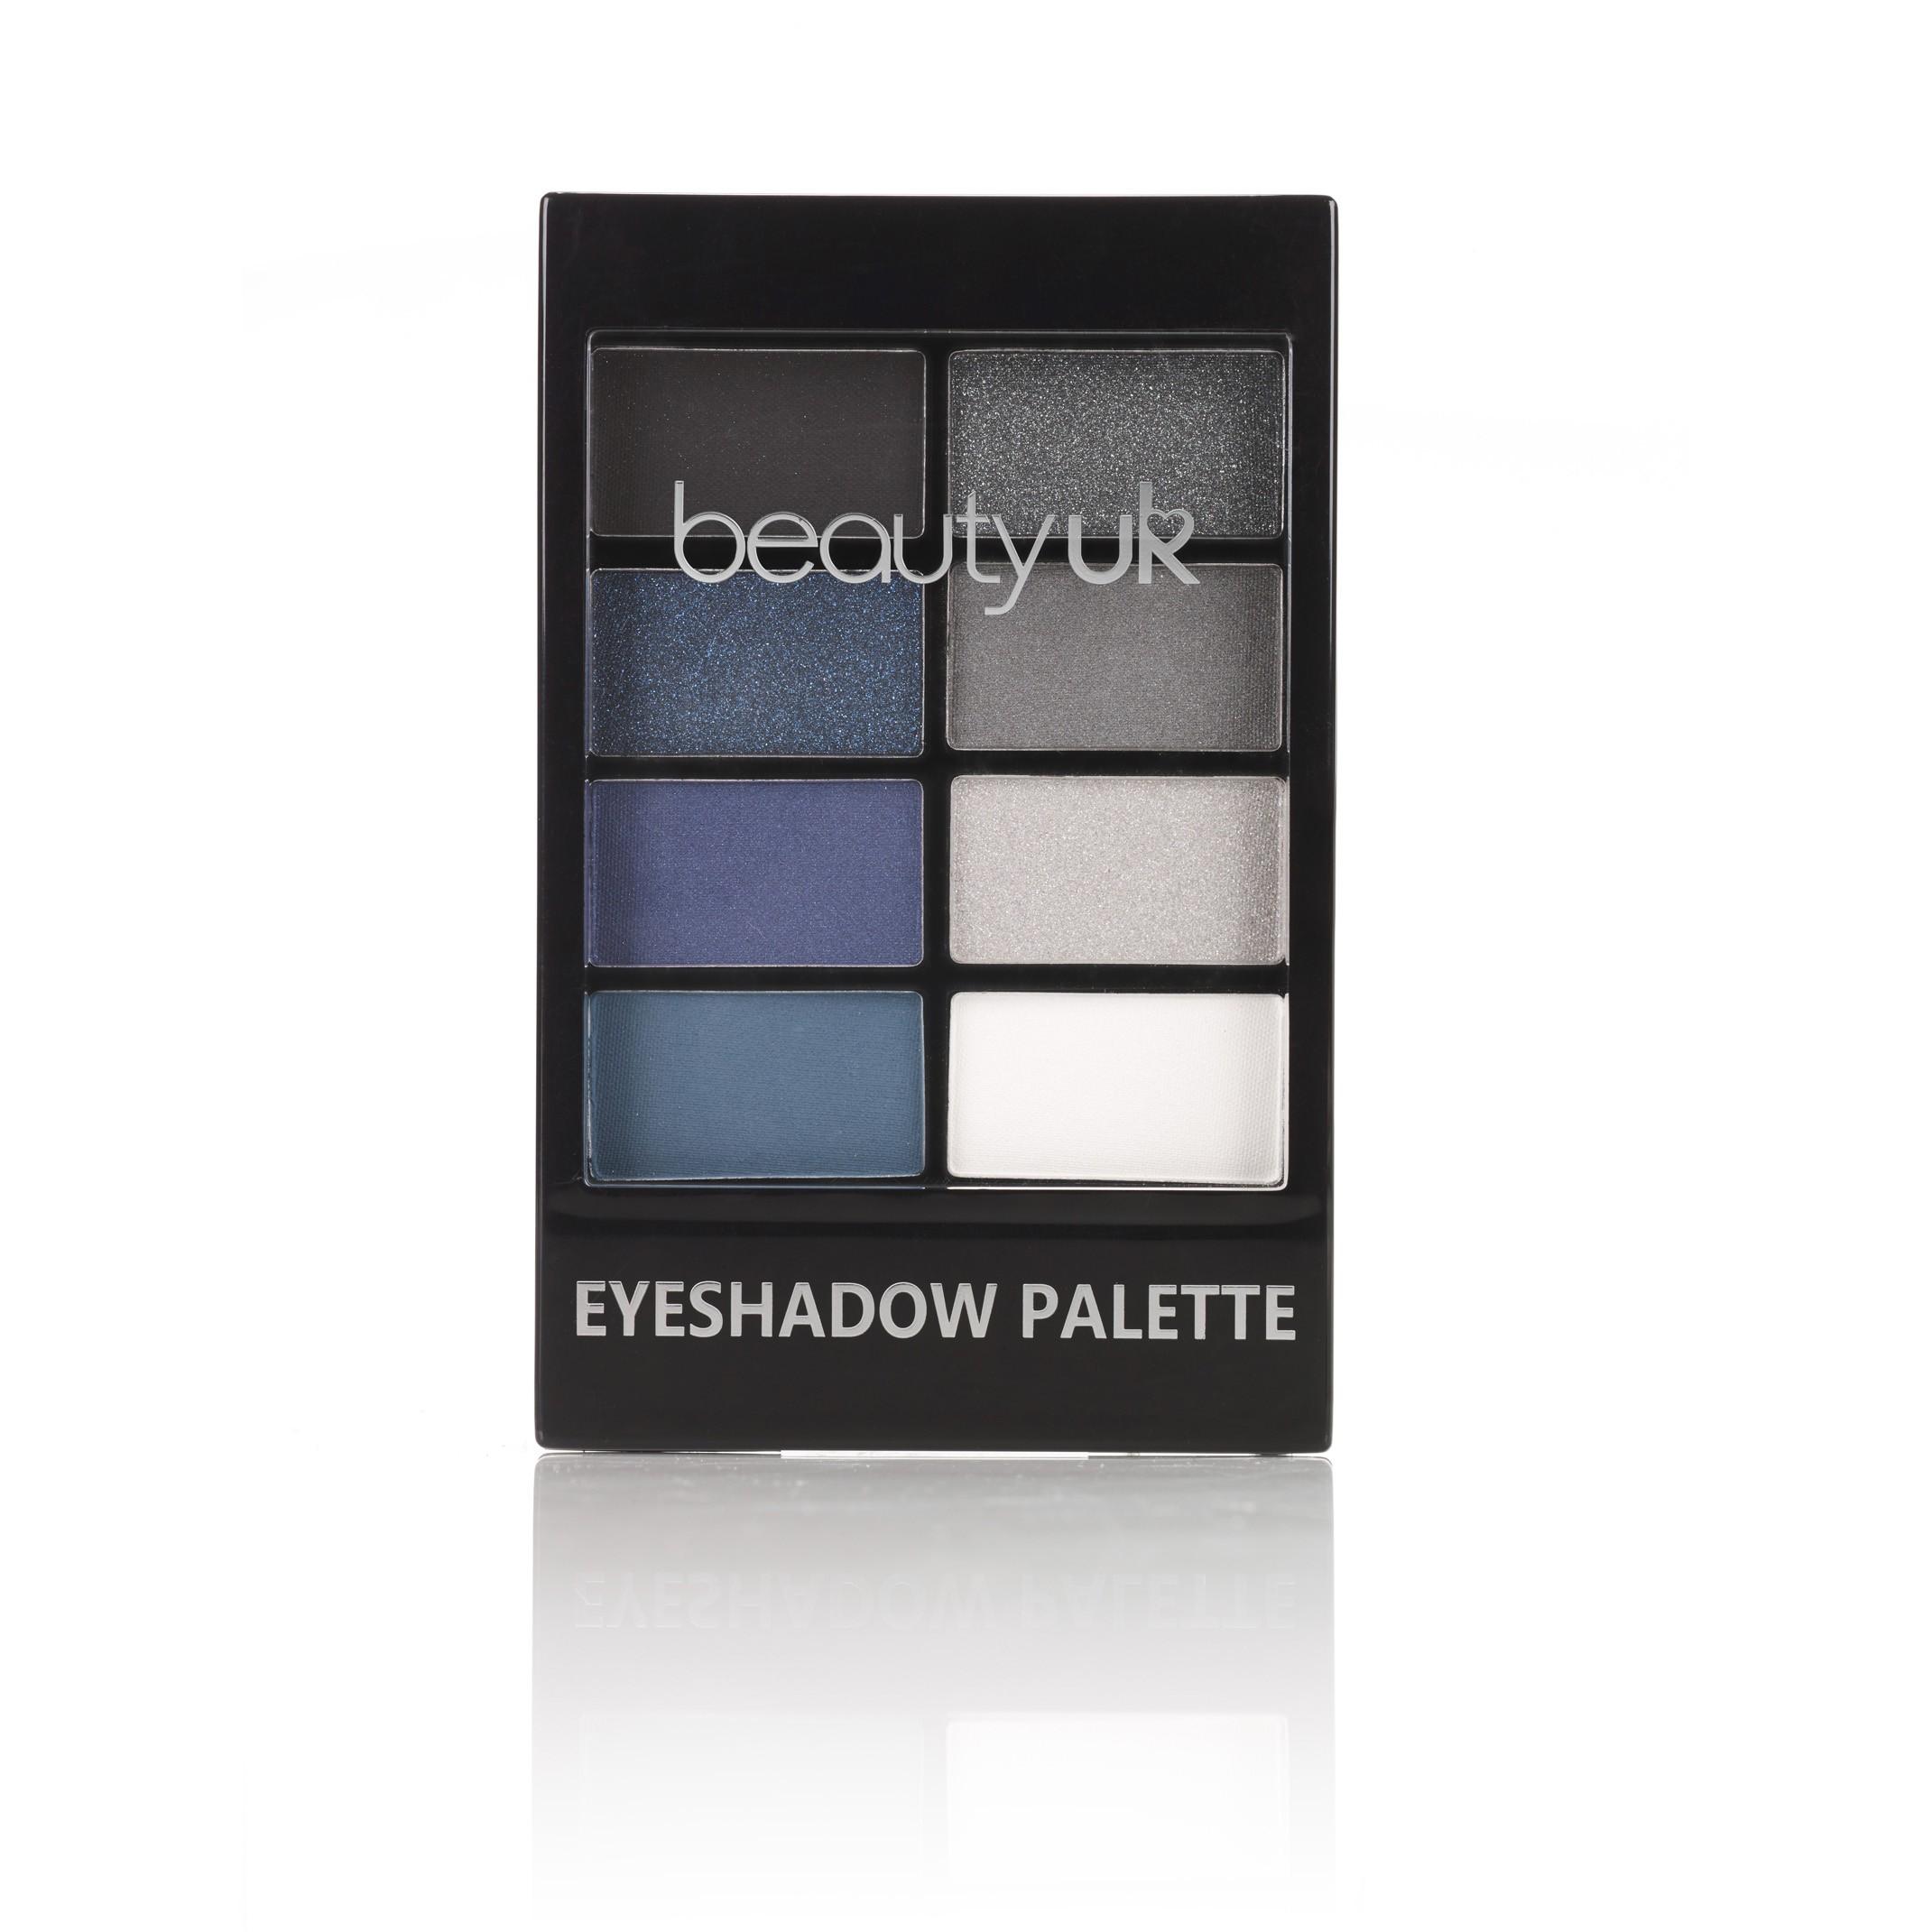 Image of beautyUK - Lidschatten-Palette - Eyeshadow Palette (ES024AD)